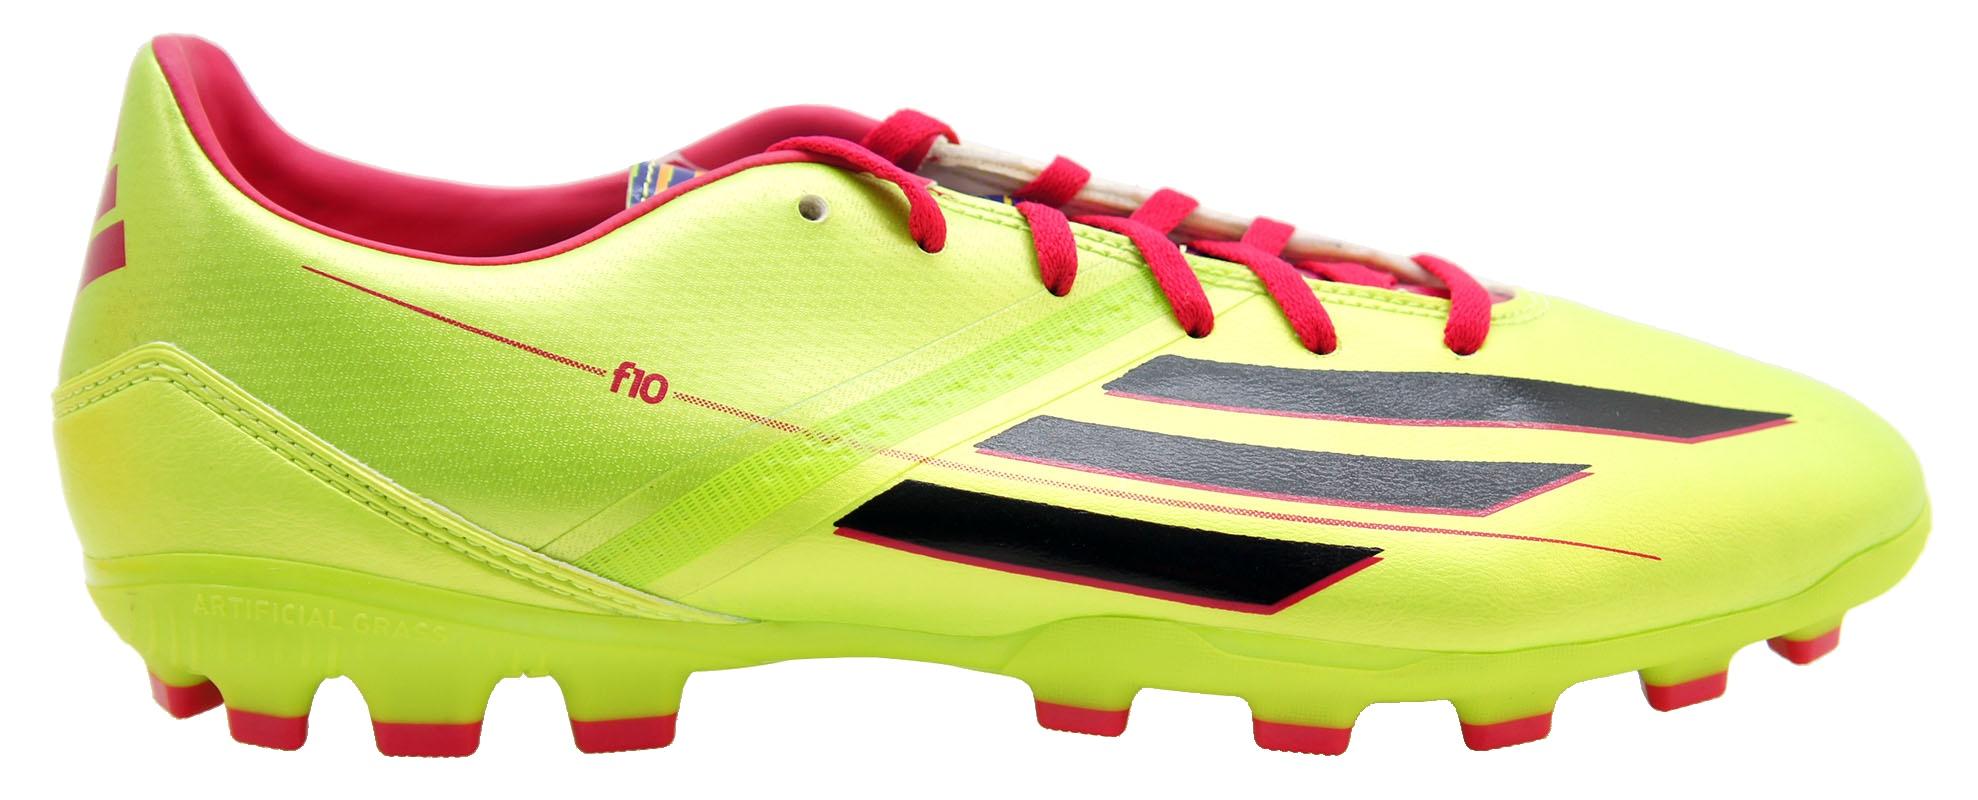 Ag F10 amp;casuals Heren Adidas Trx Geel Sport Voetbalschoenen Internet SUqVGMzp